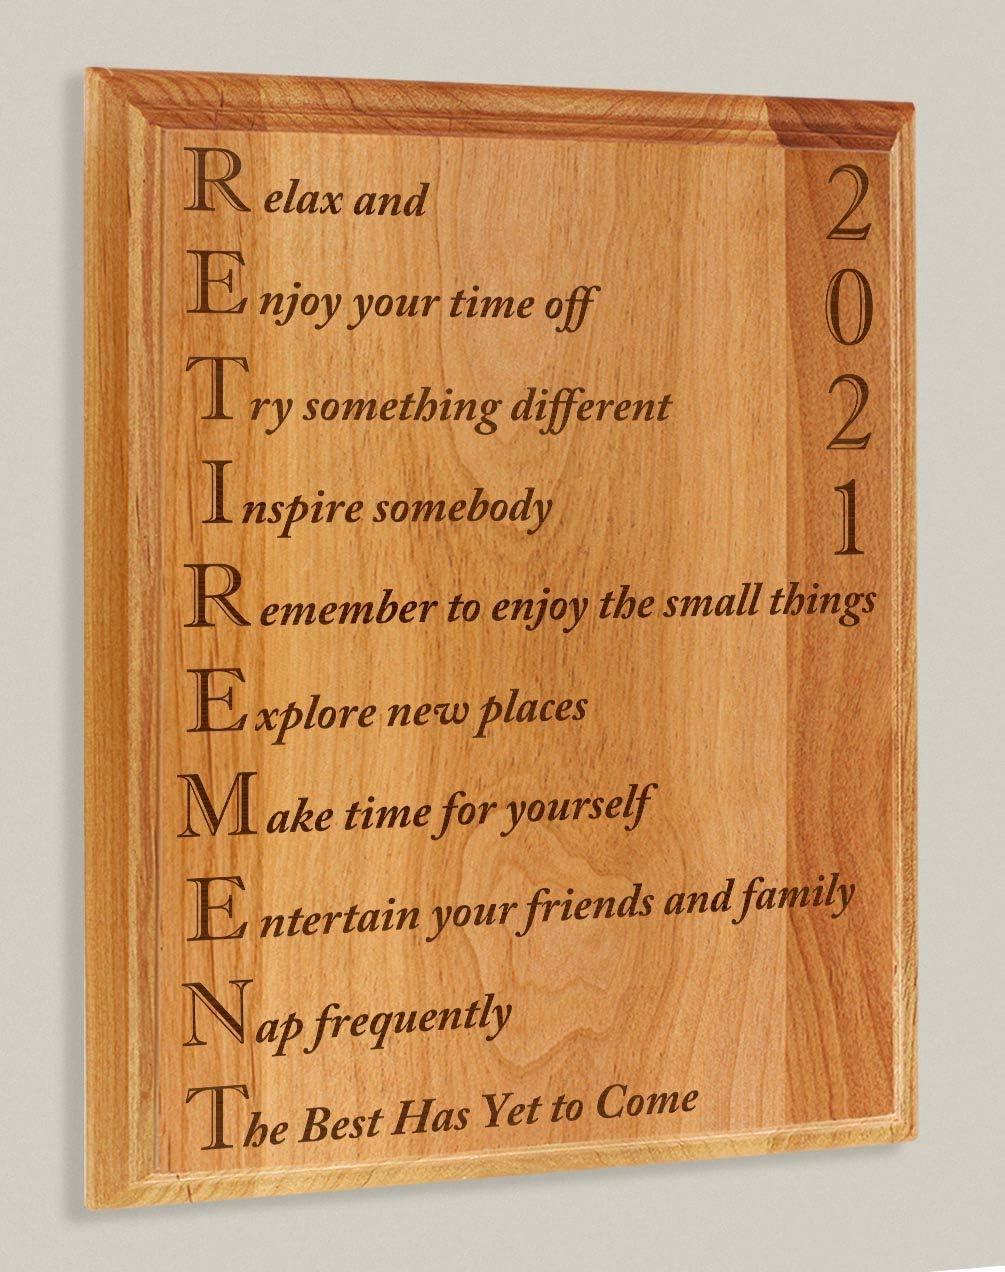 Amazon Com Thiswear Retirement Gifts Women Men Retirement 2021 Retired Poem Retirement Gift Ideas Coworker 7x9 Oak Wood Engraved Plaque Wood Home Kitchen